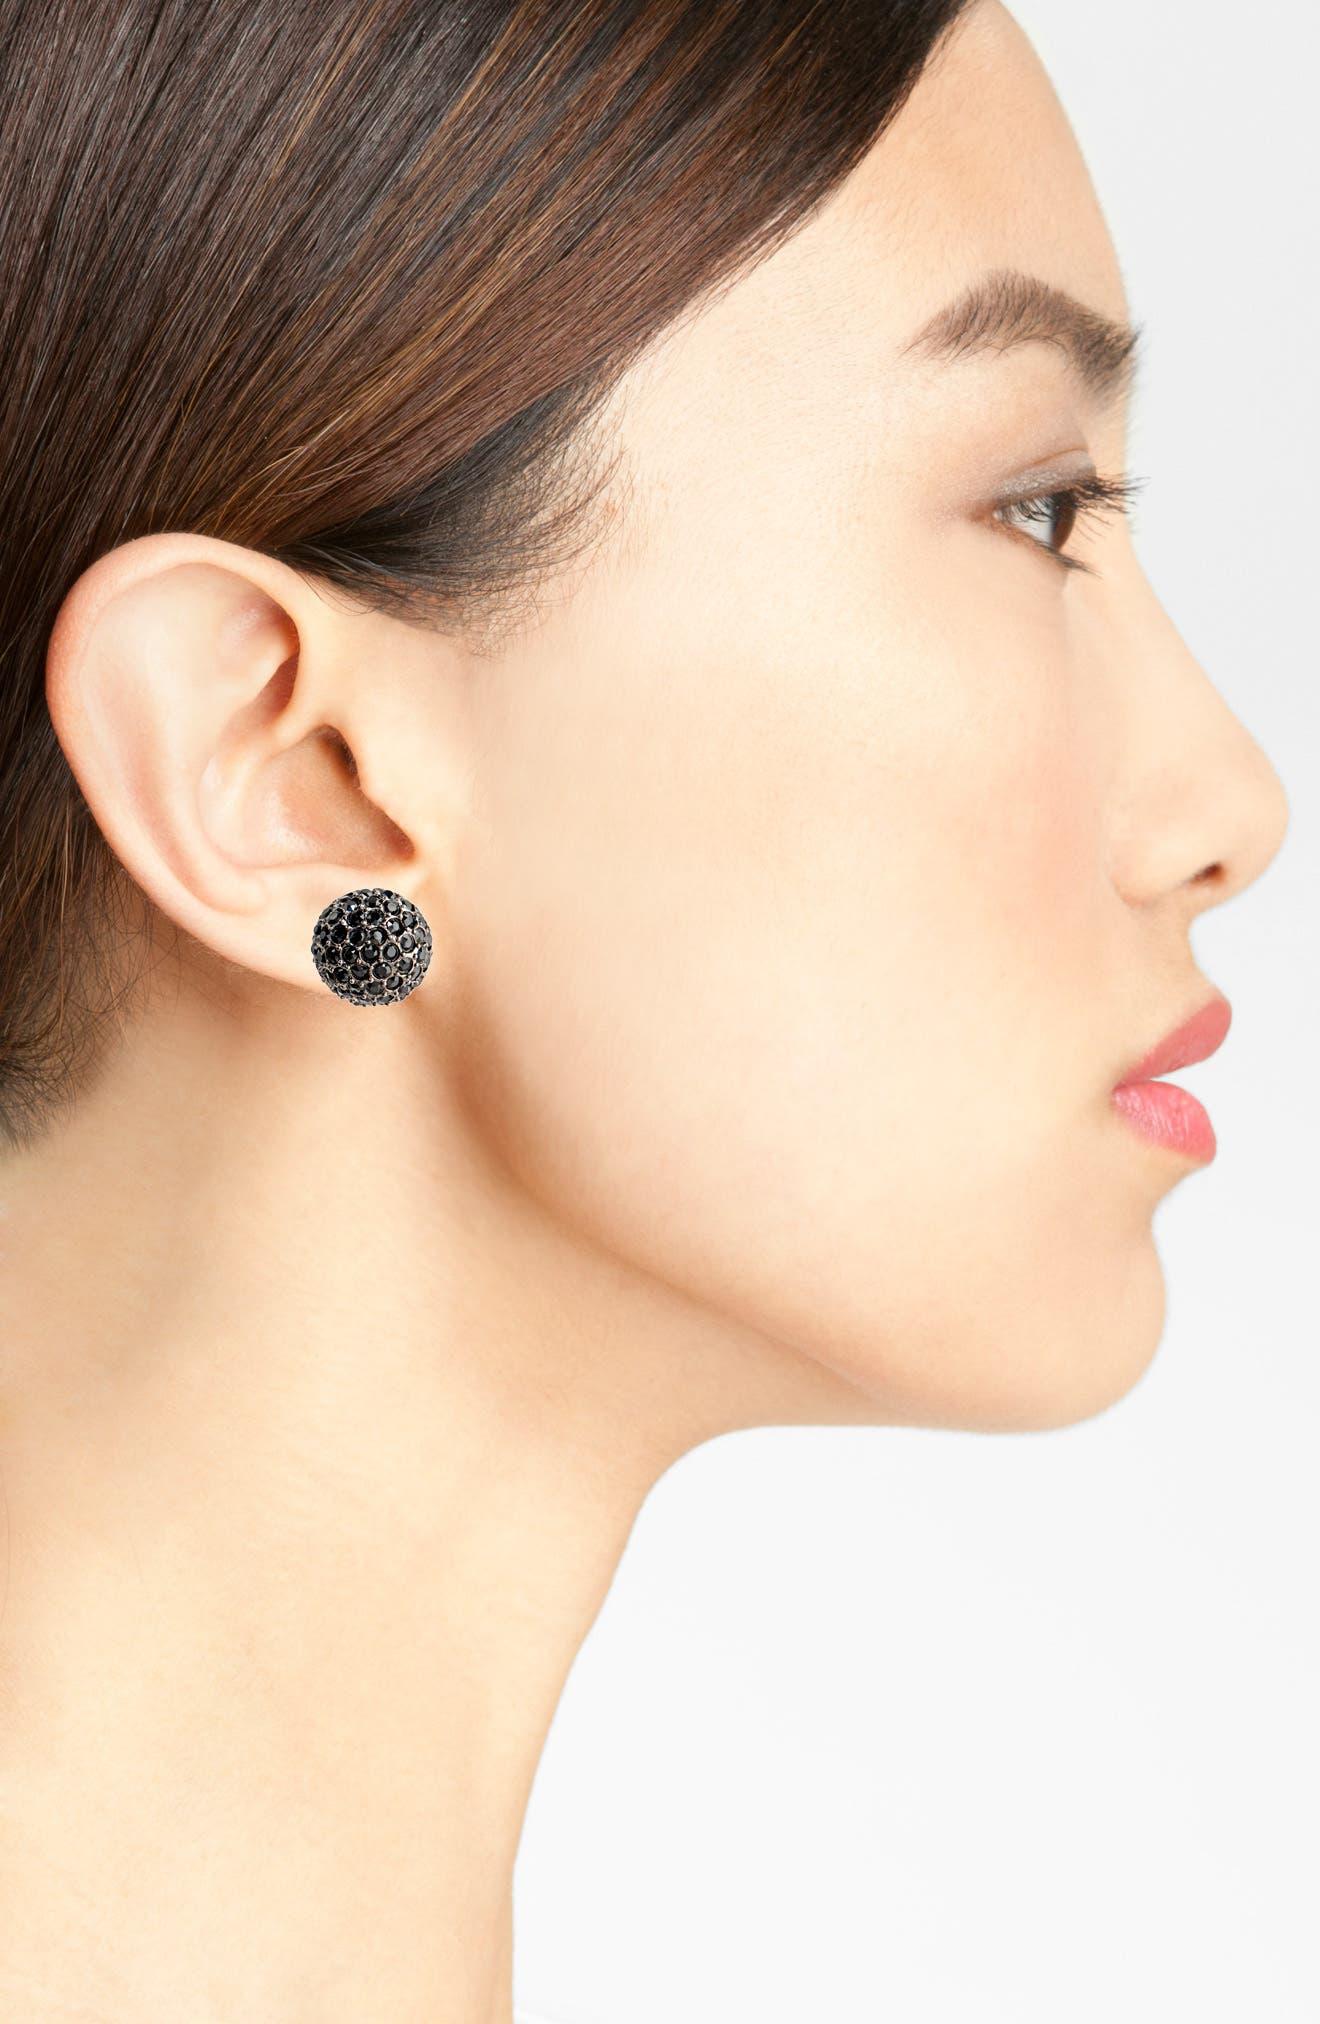 Dome Stud Earrings,                             Alternate thumbnail 2, color,                             001